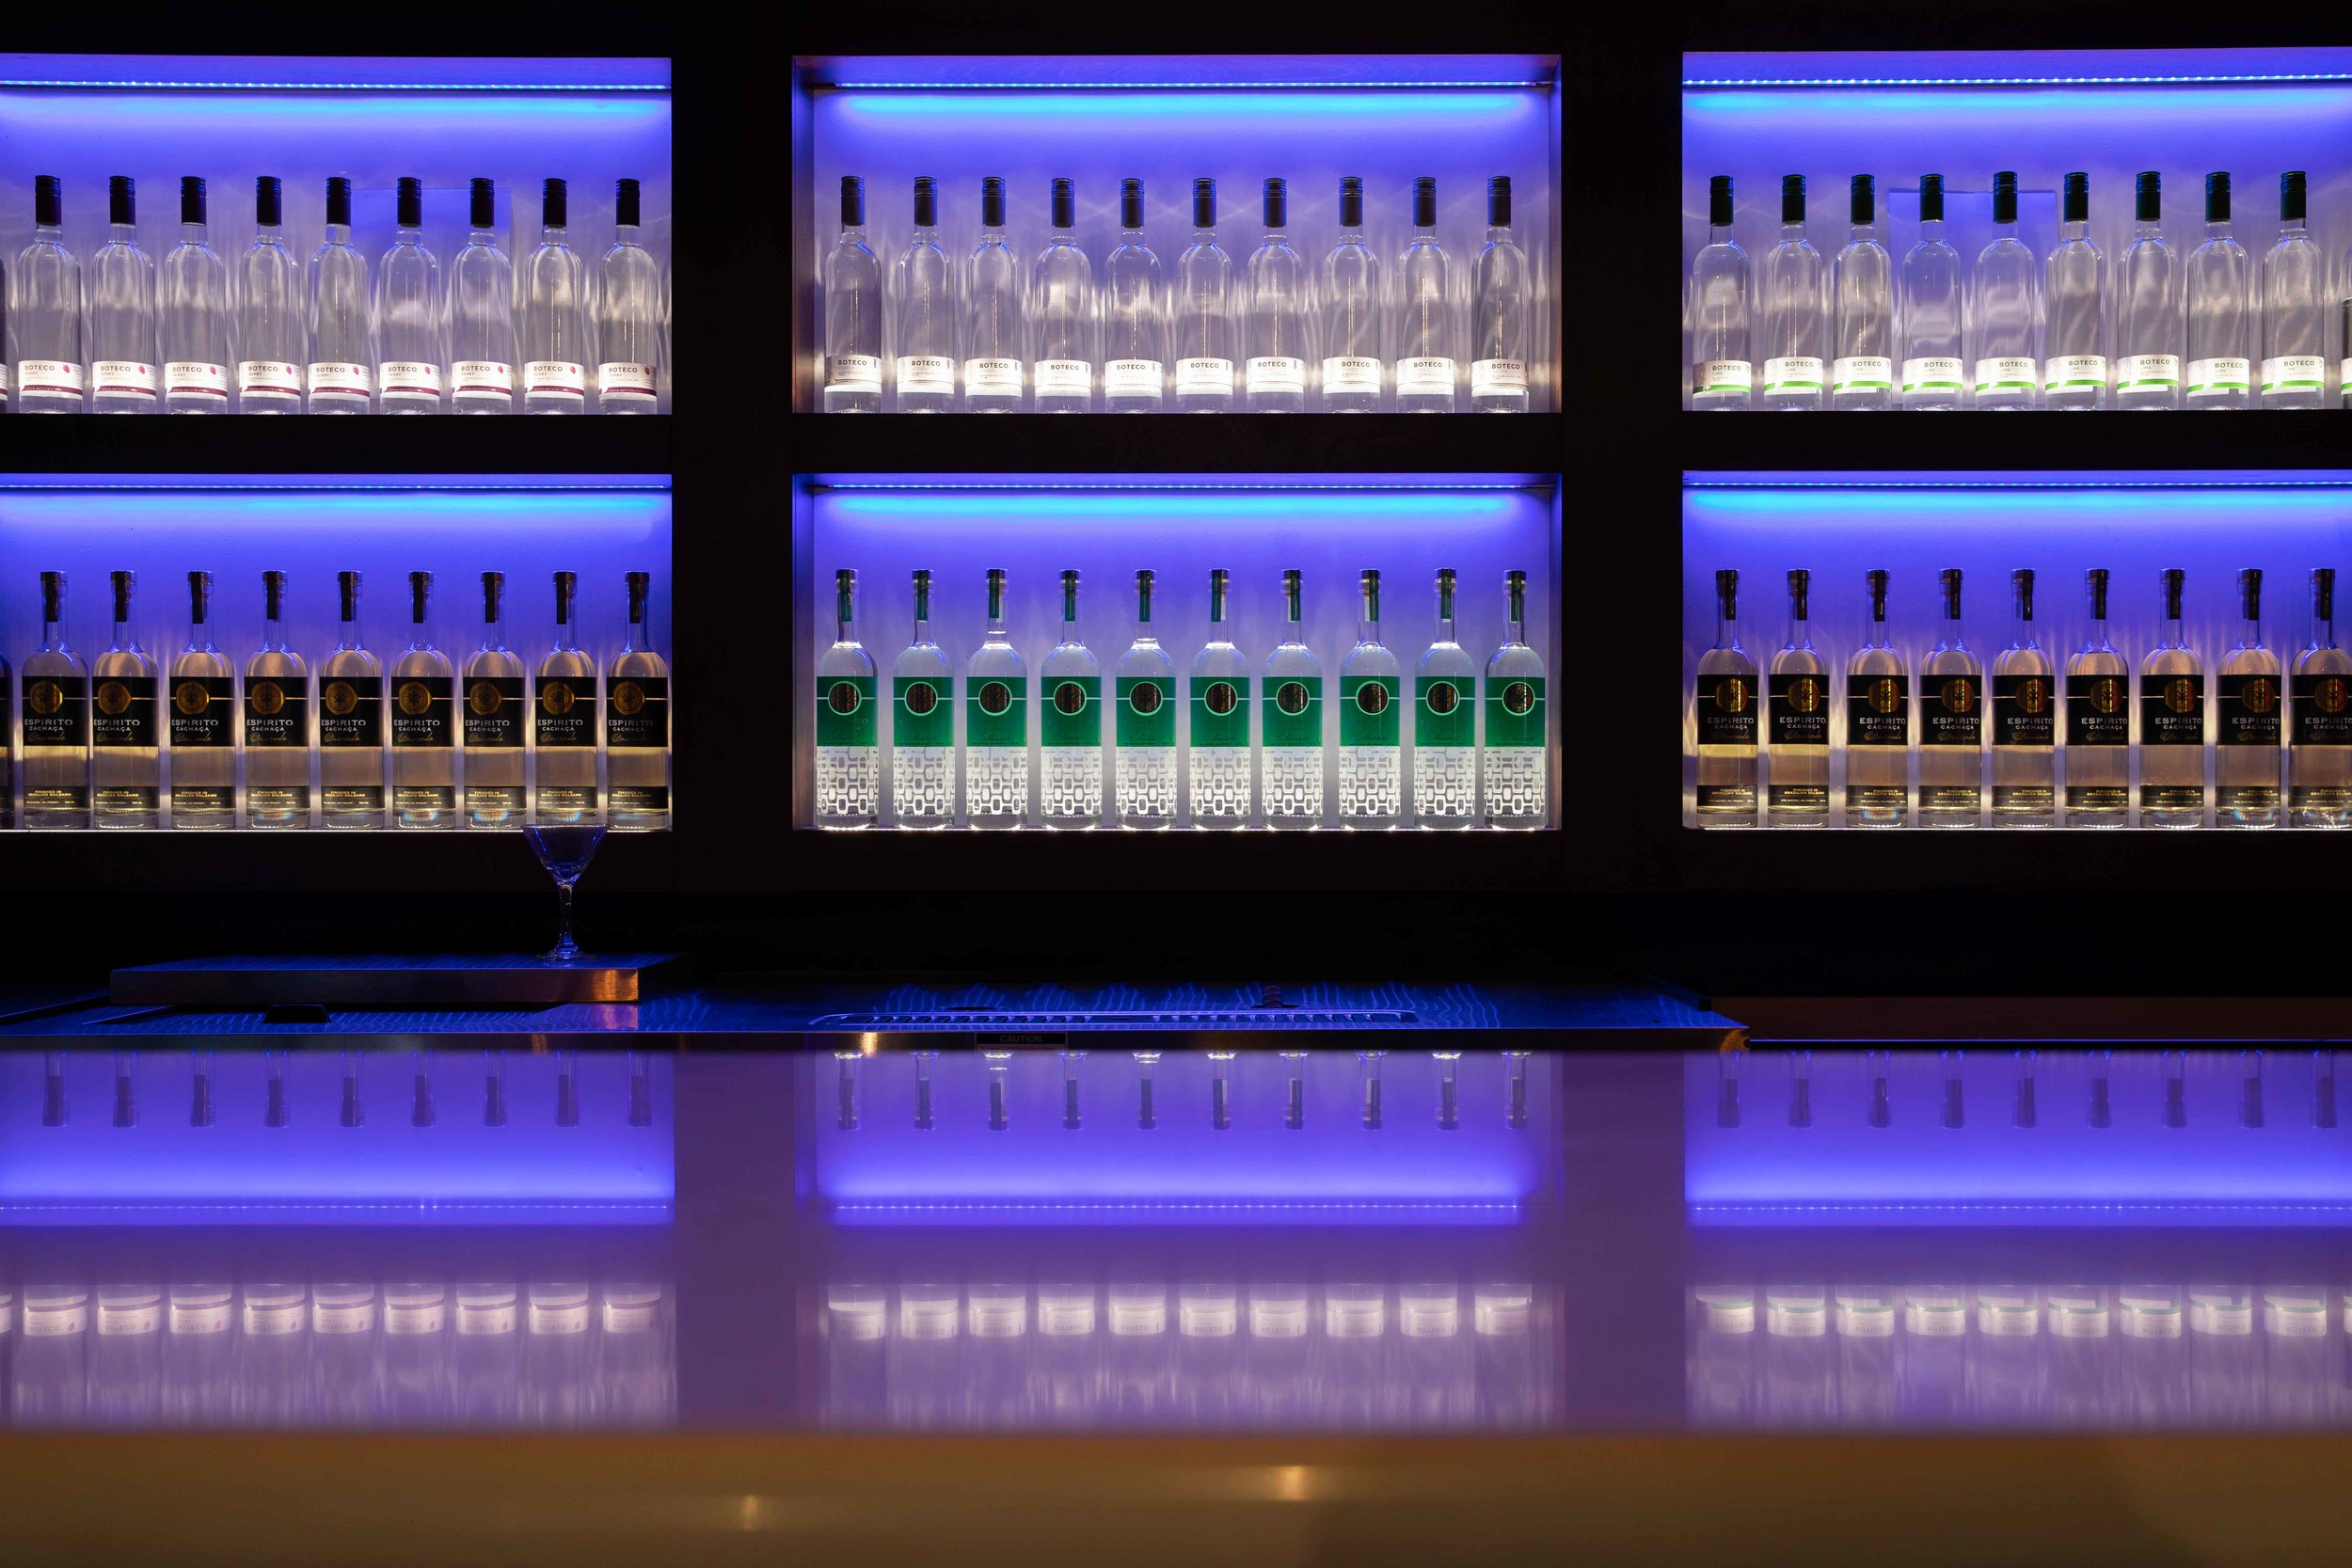 Visit the Still at AMBRAbev - Backbar featuring Espirito Cachaça and BOTECO Vodka.jpg